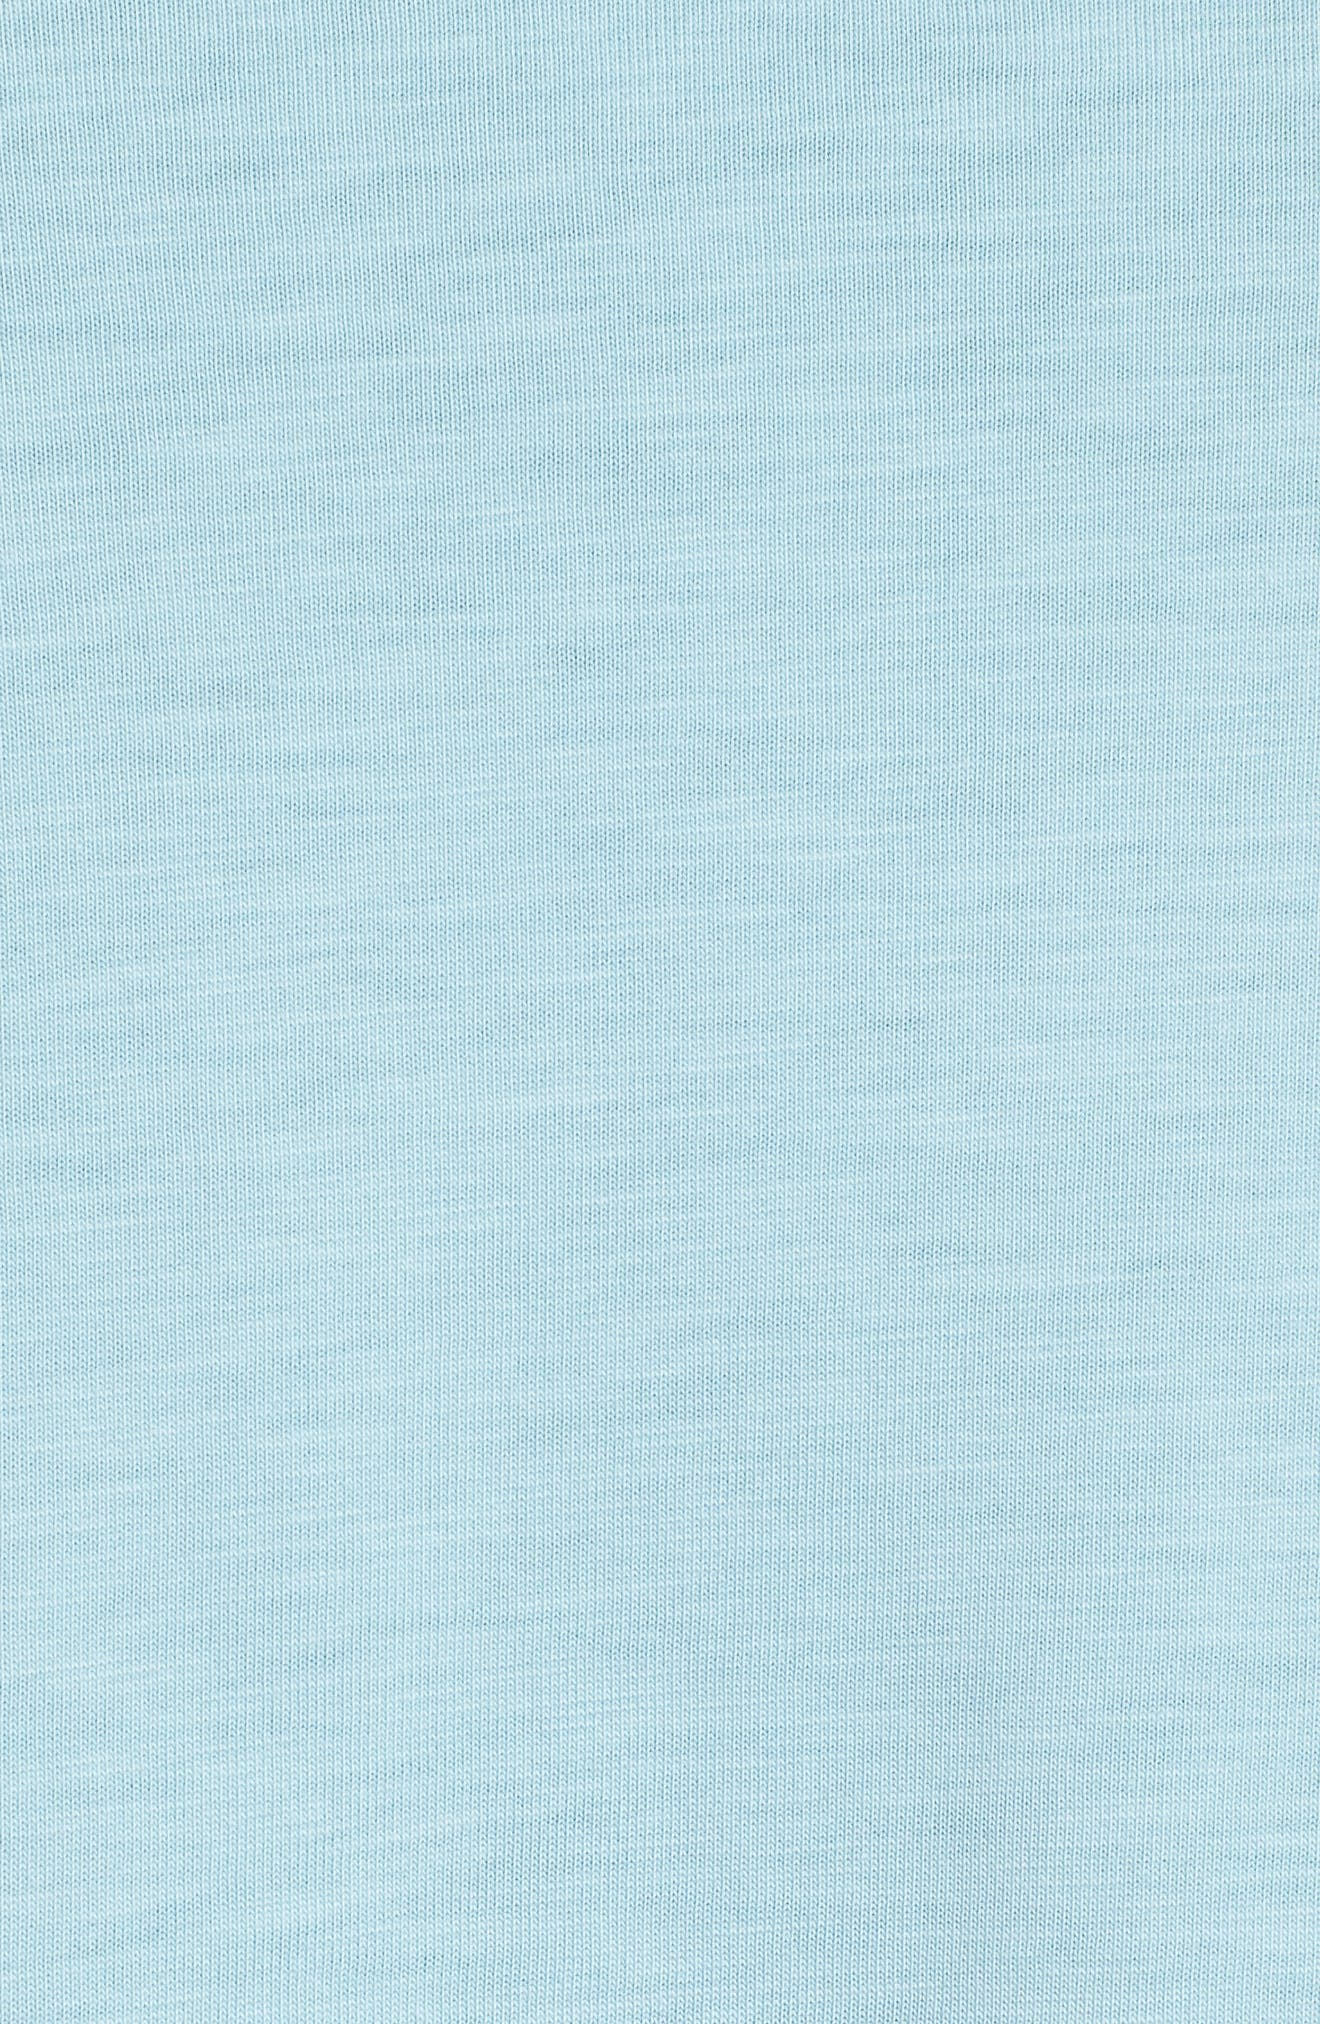 Sportswear AF1 Graphic T-Shirt,                             Alternate thumbnail 5, color,                             OCEAN BLISS/ NOISE AQUA